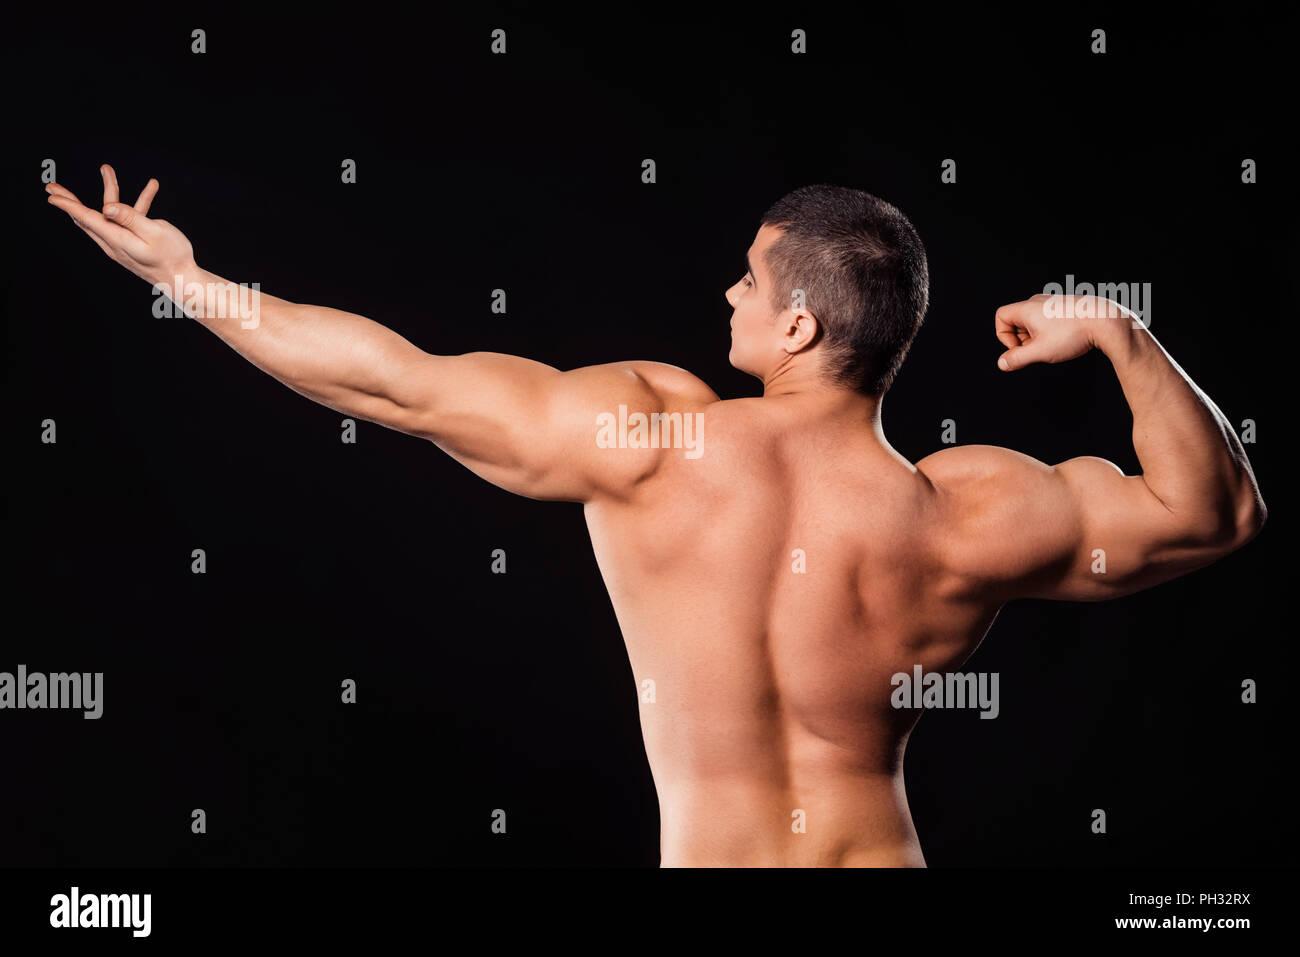 Bodybuilder in archer pose. - Stock Image